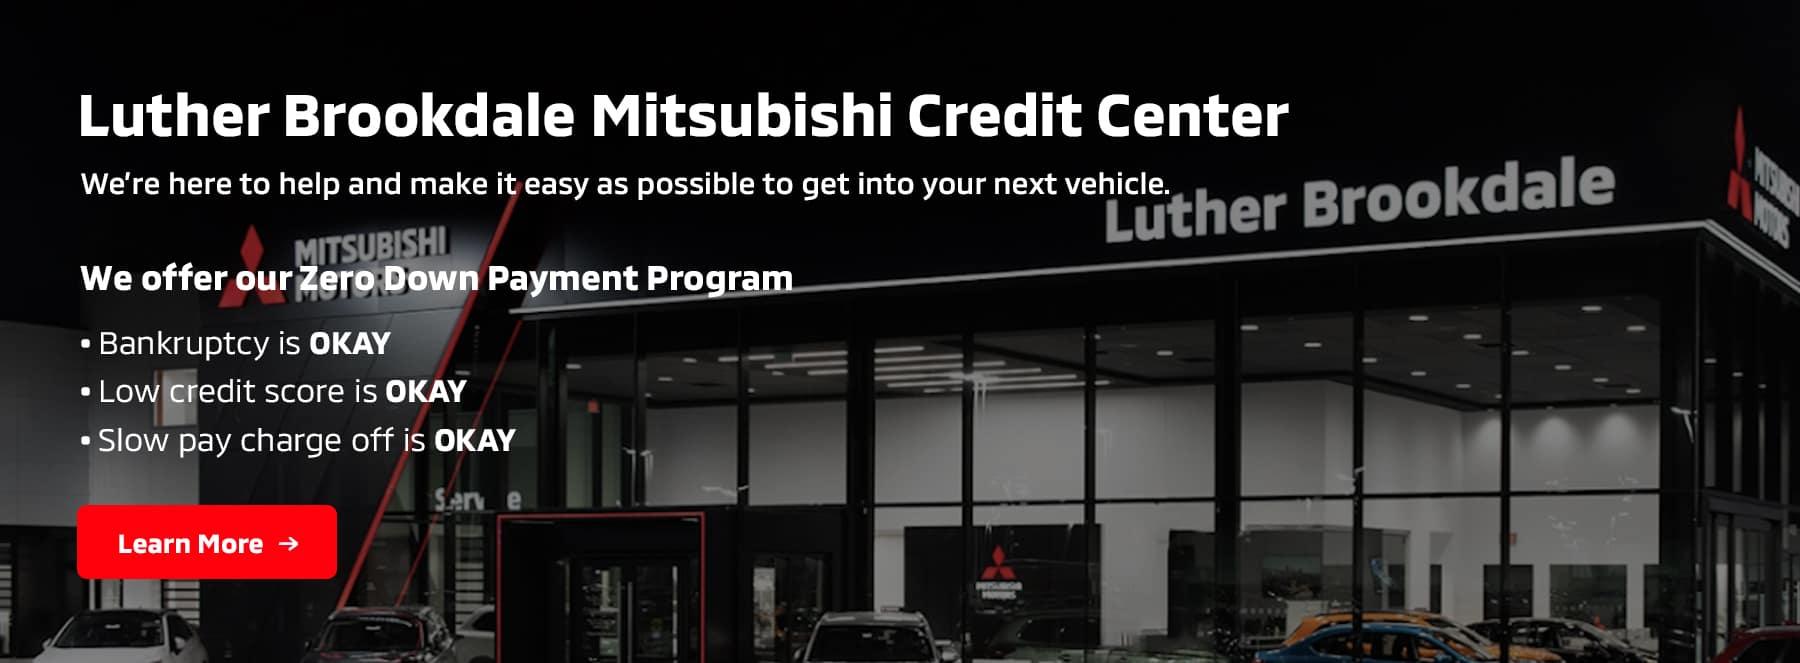 Mitsubishi Credit Center